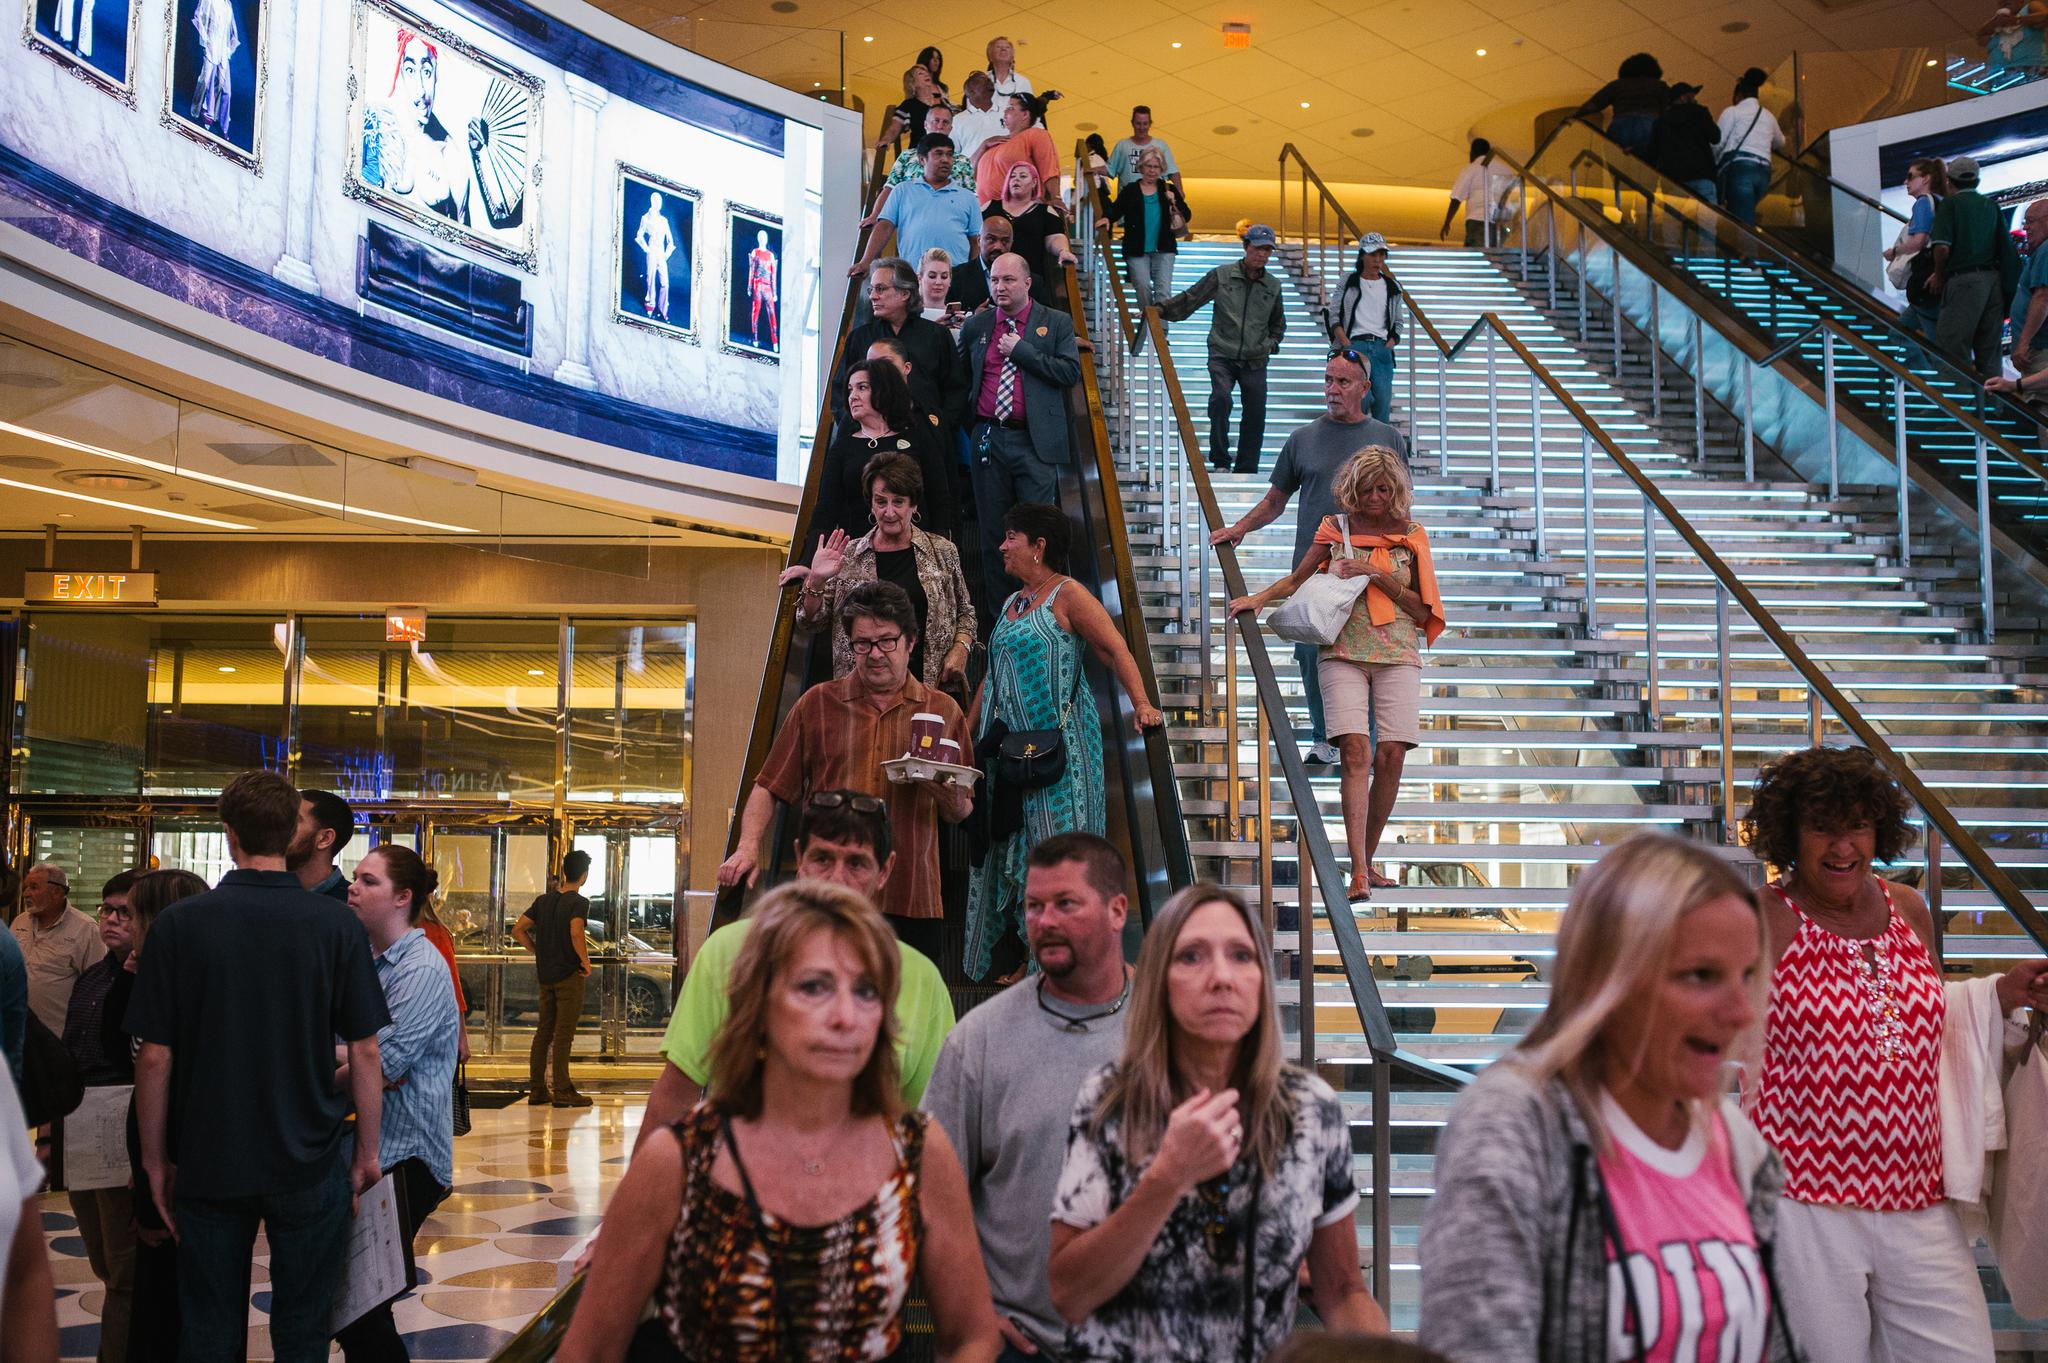 best casino game odds in atlantic city